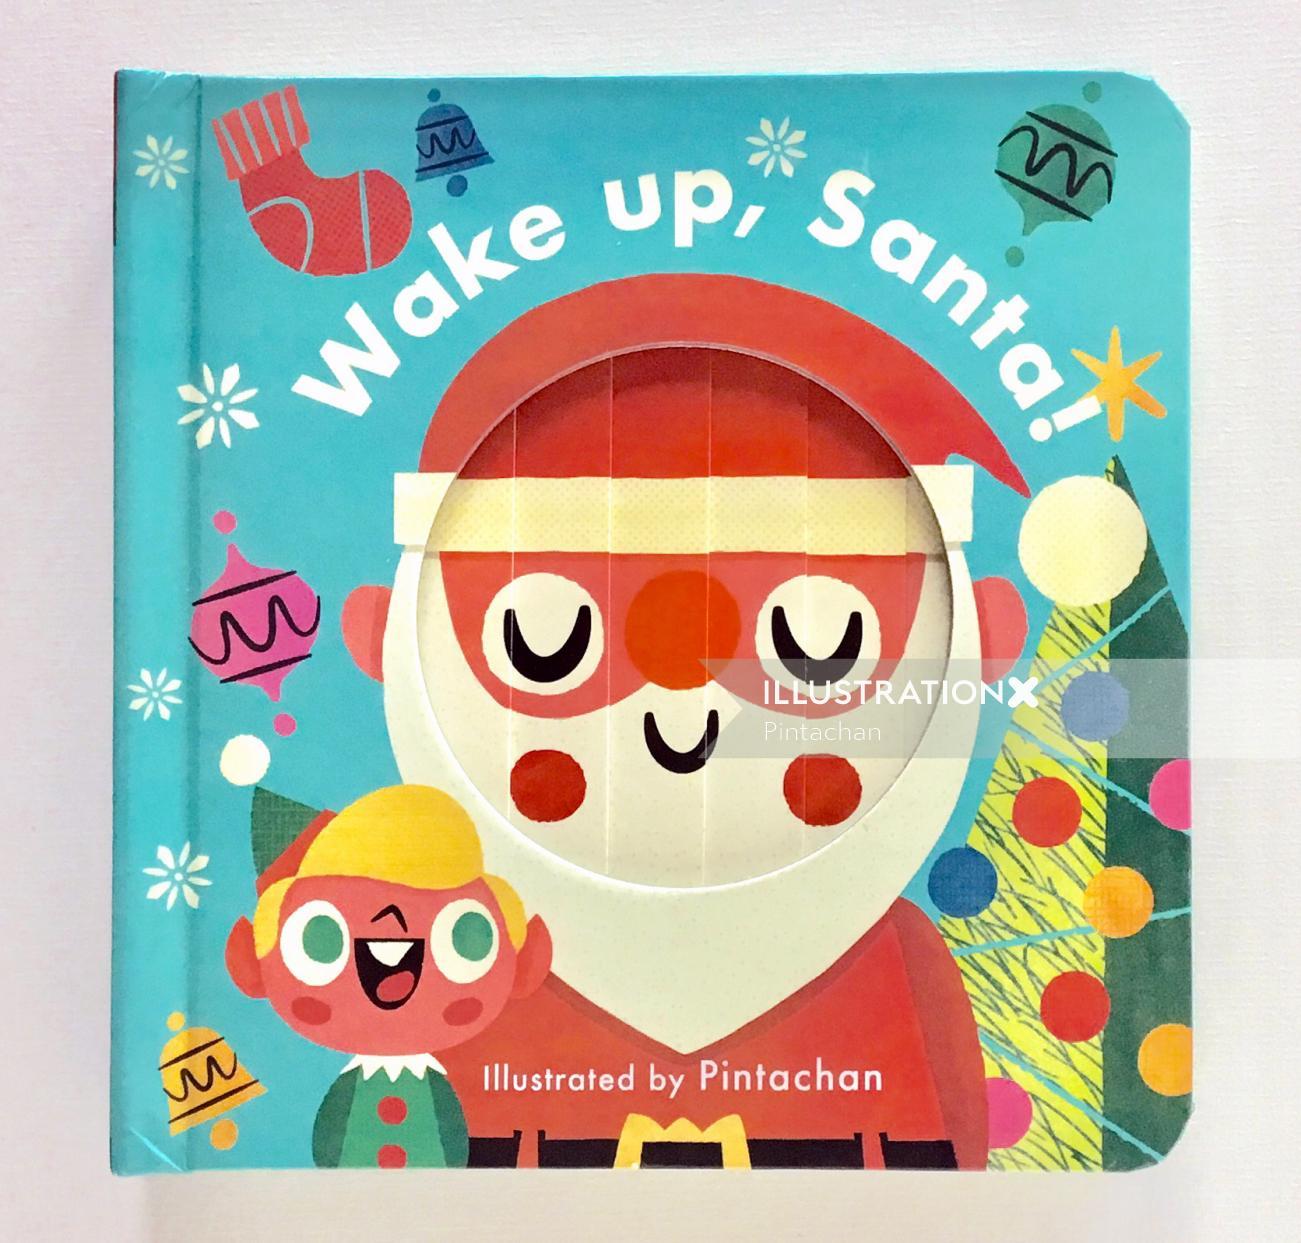 Wake up Santa graphical painting